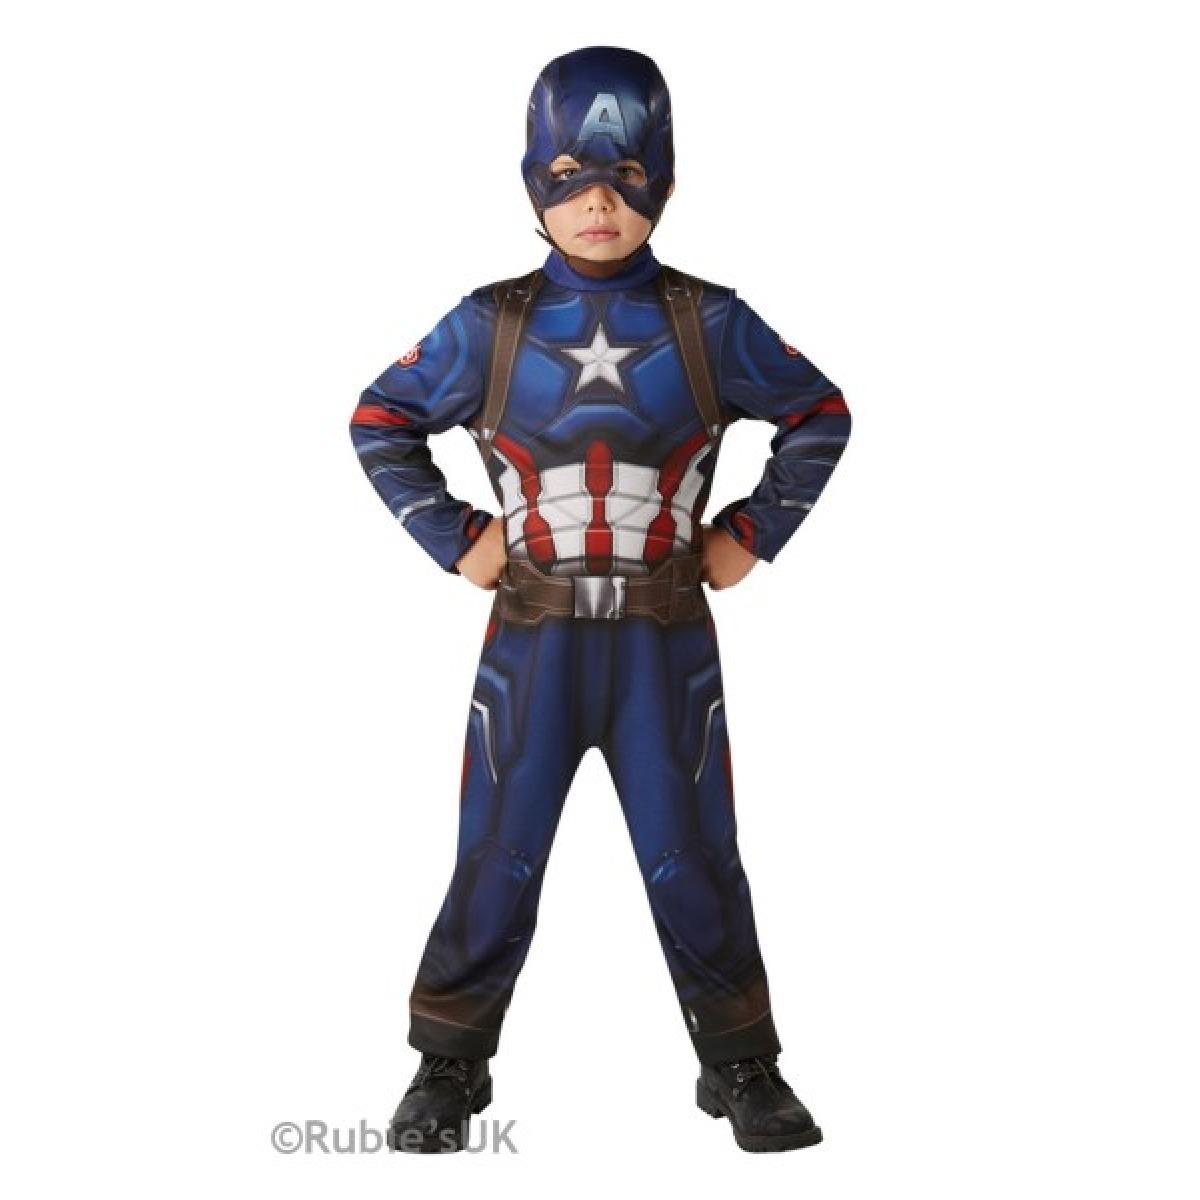 Kids_Captain_America_Costume_Civil_War_7-8 Years